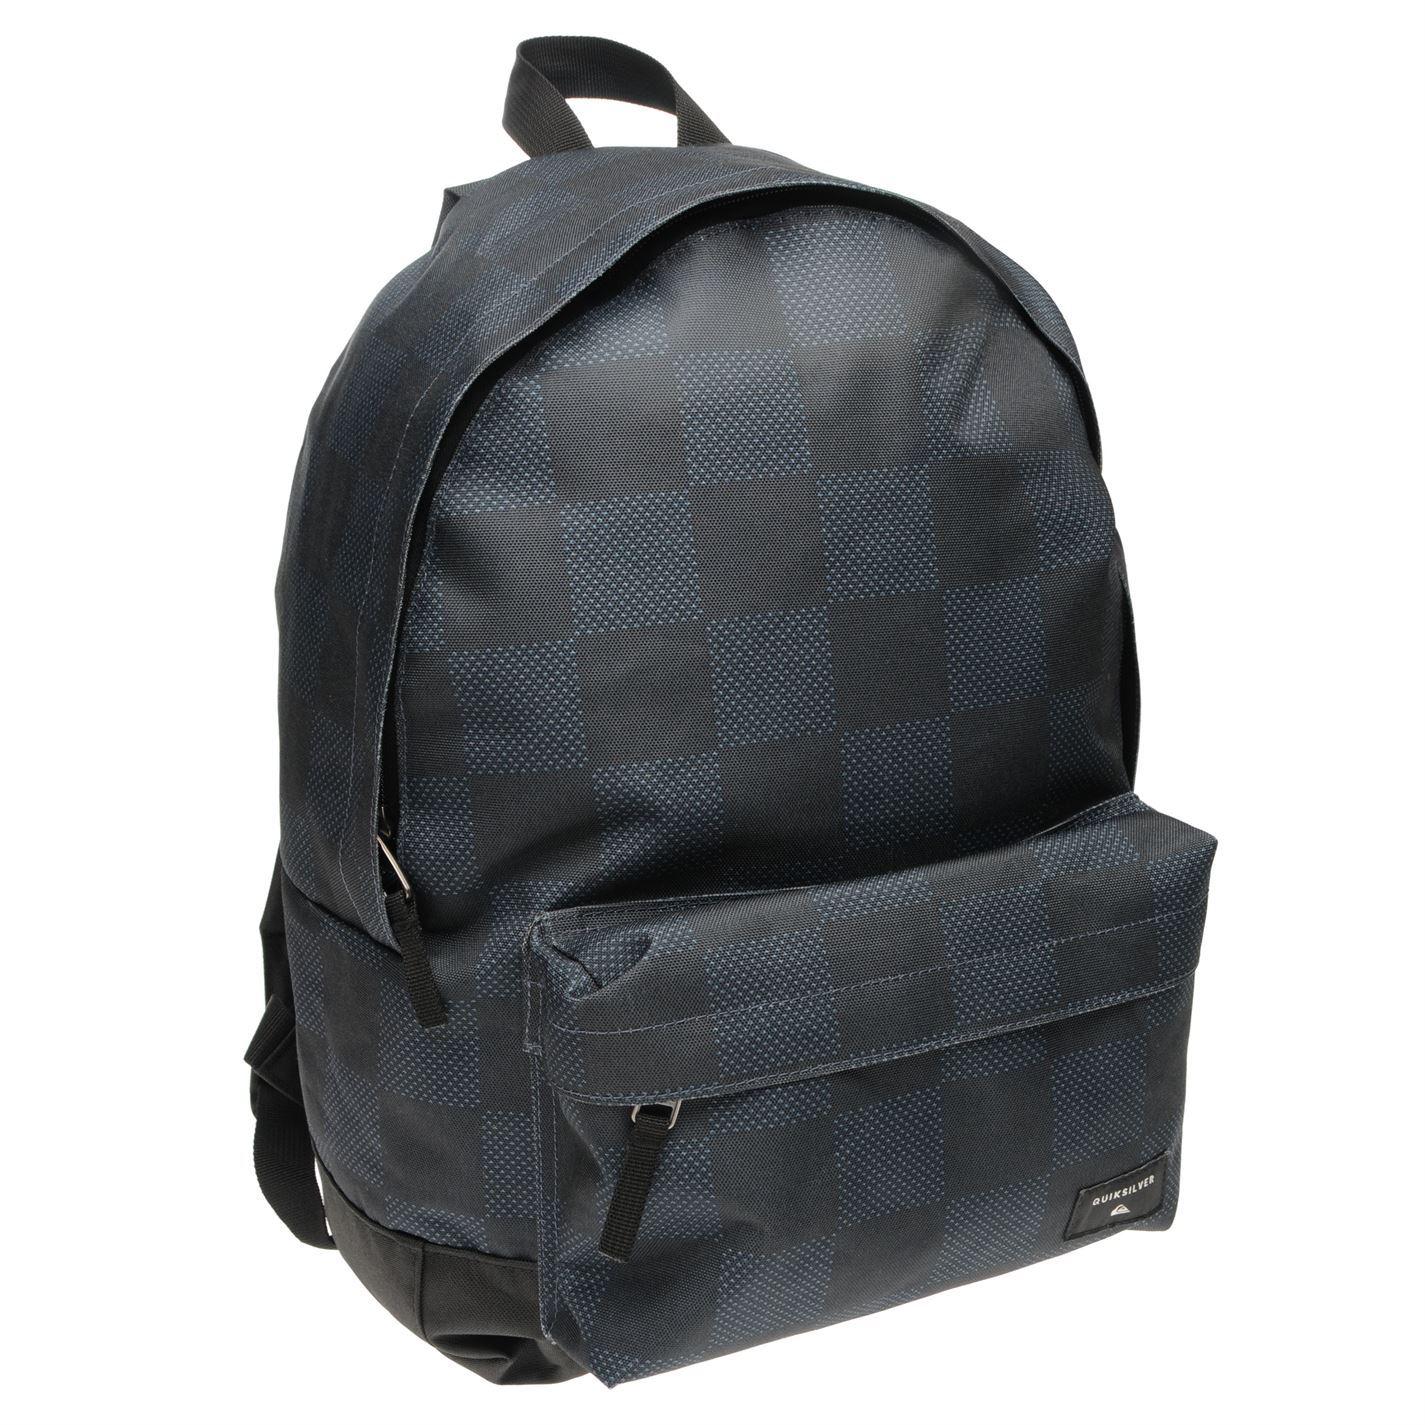 ffb3663e94 ... Quiksilver Backpacks Rucksack Backpack Bag Daypack